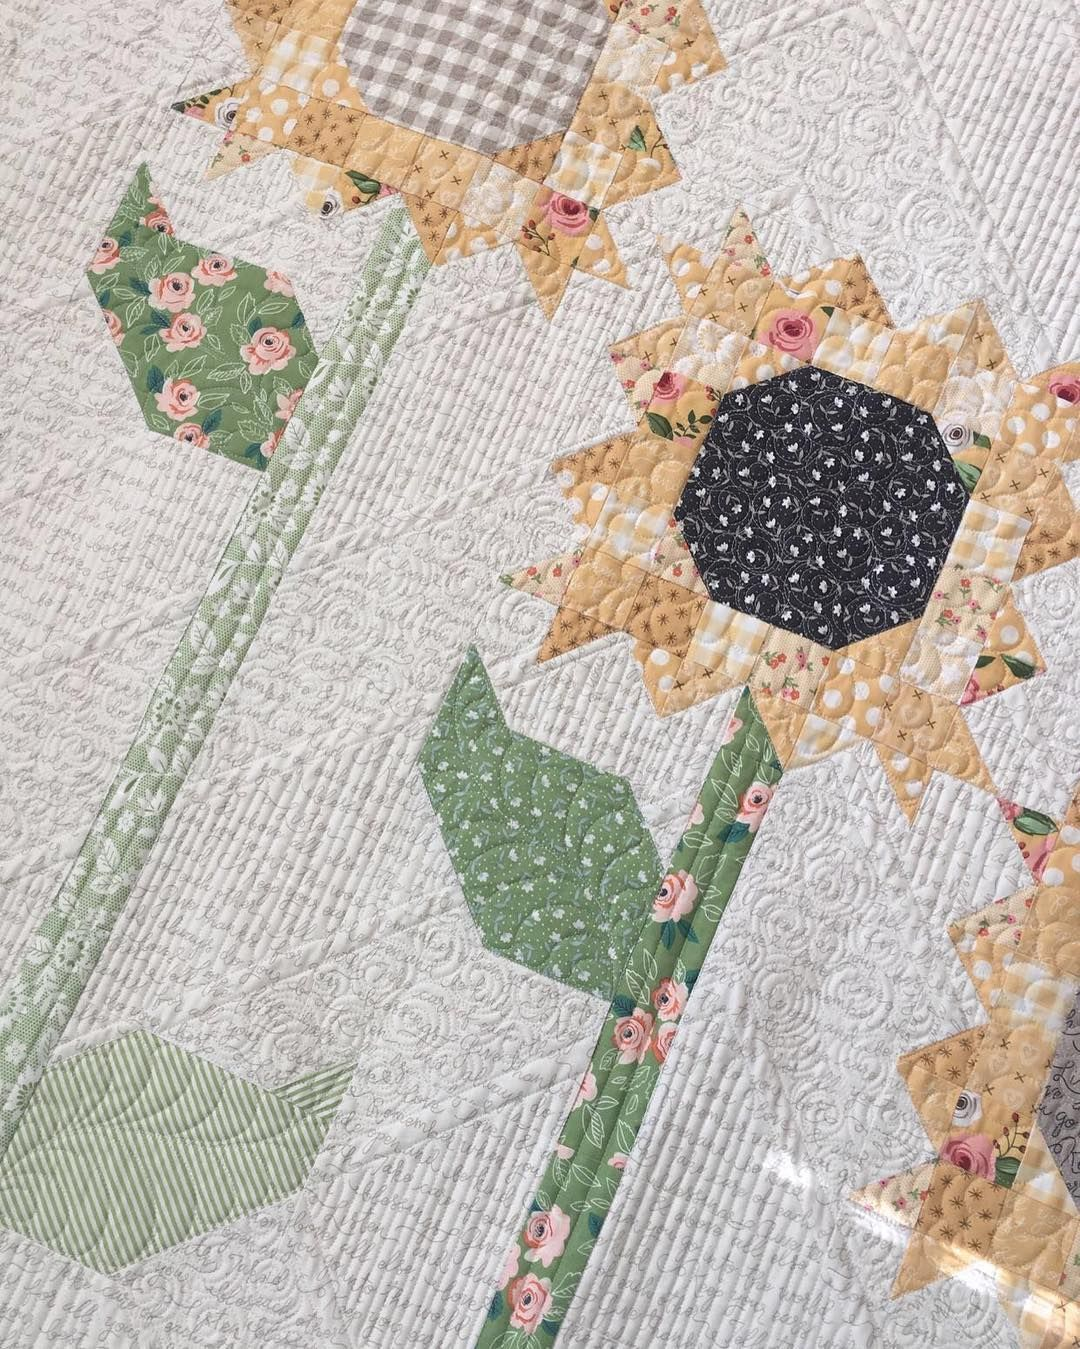 Pin de Tonya Dunning en quilts | Pinterest | Puntadas y Varios